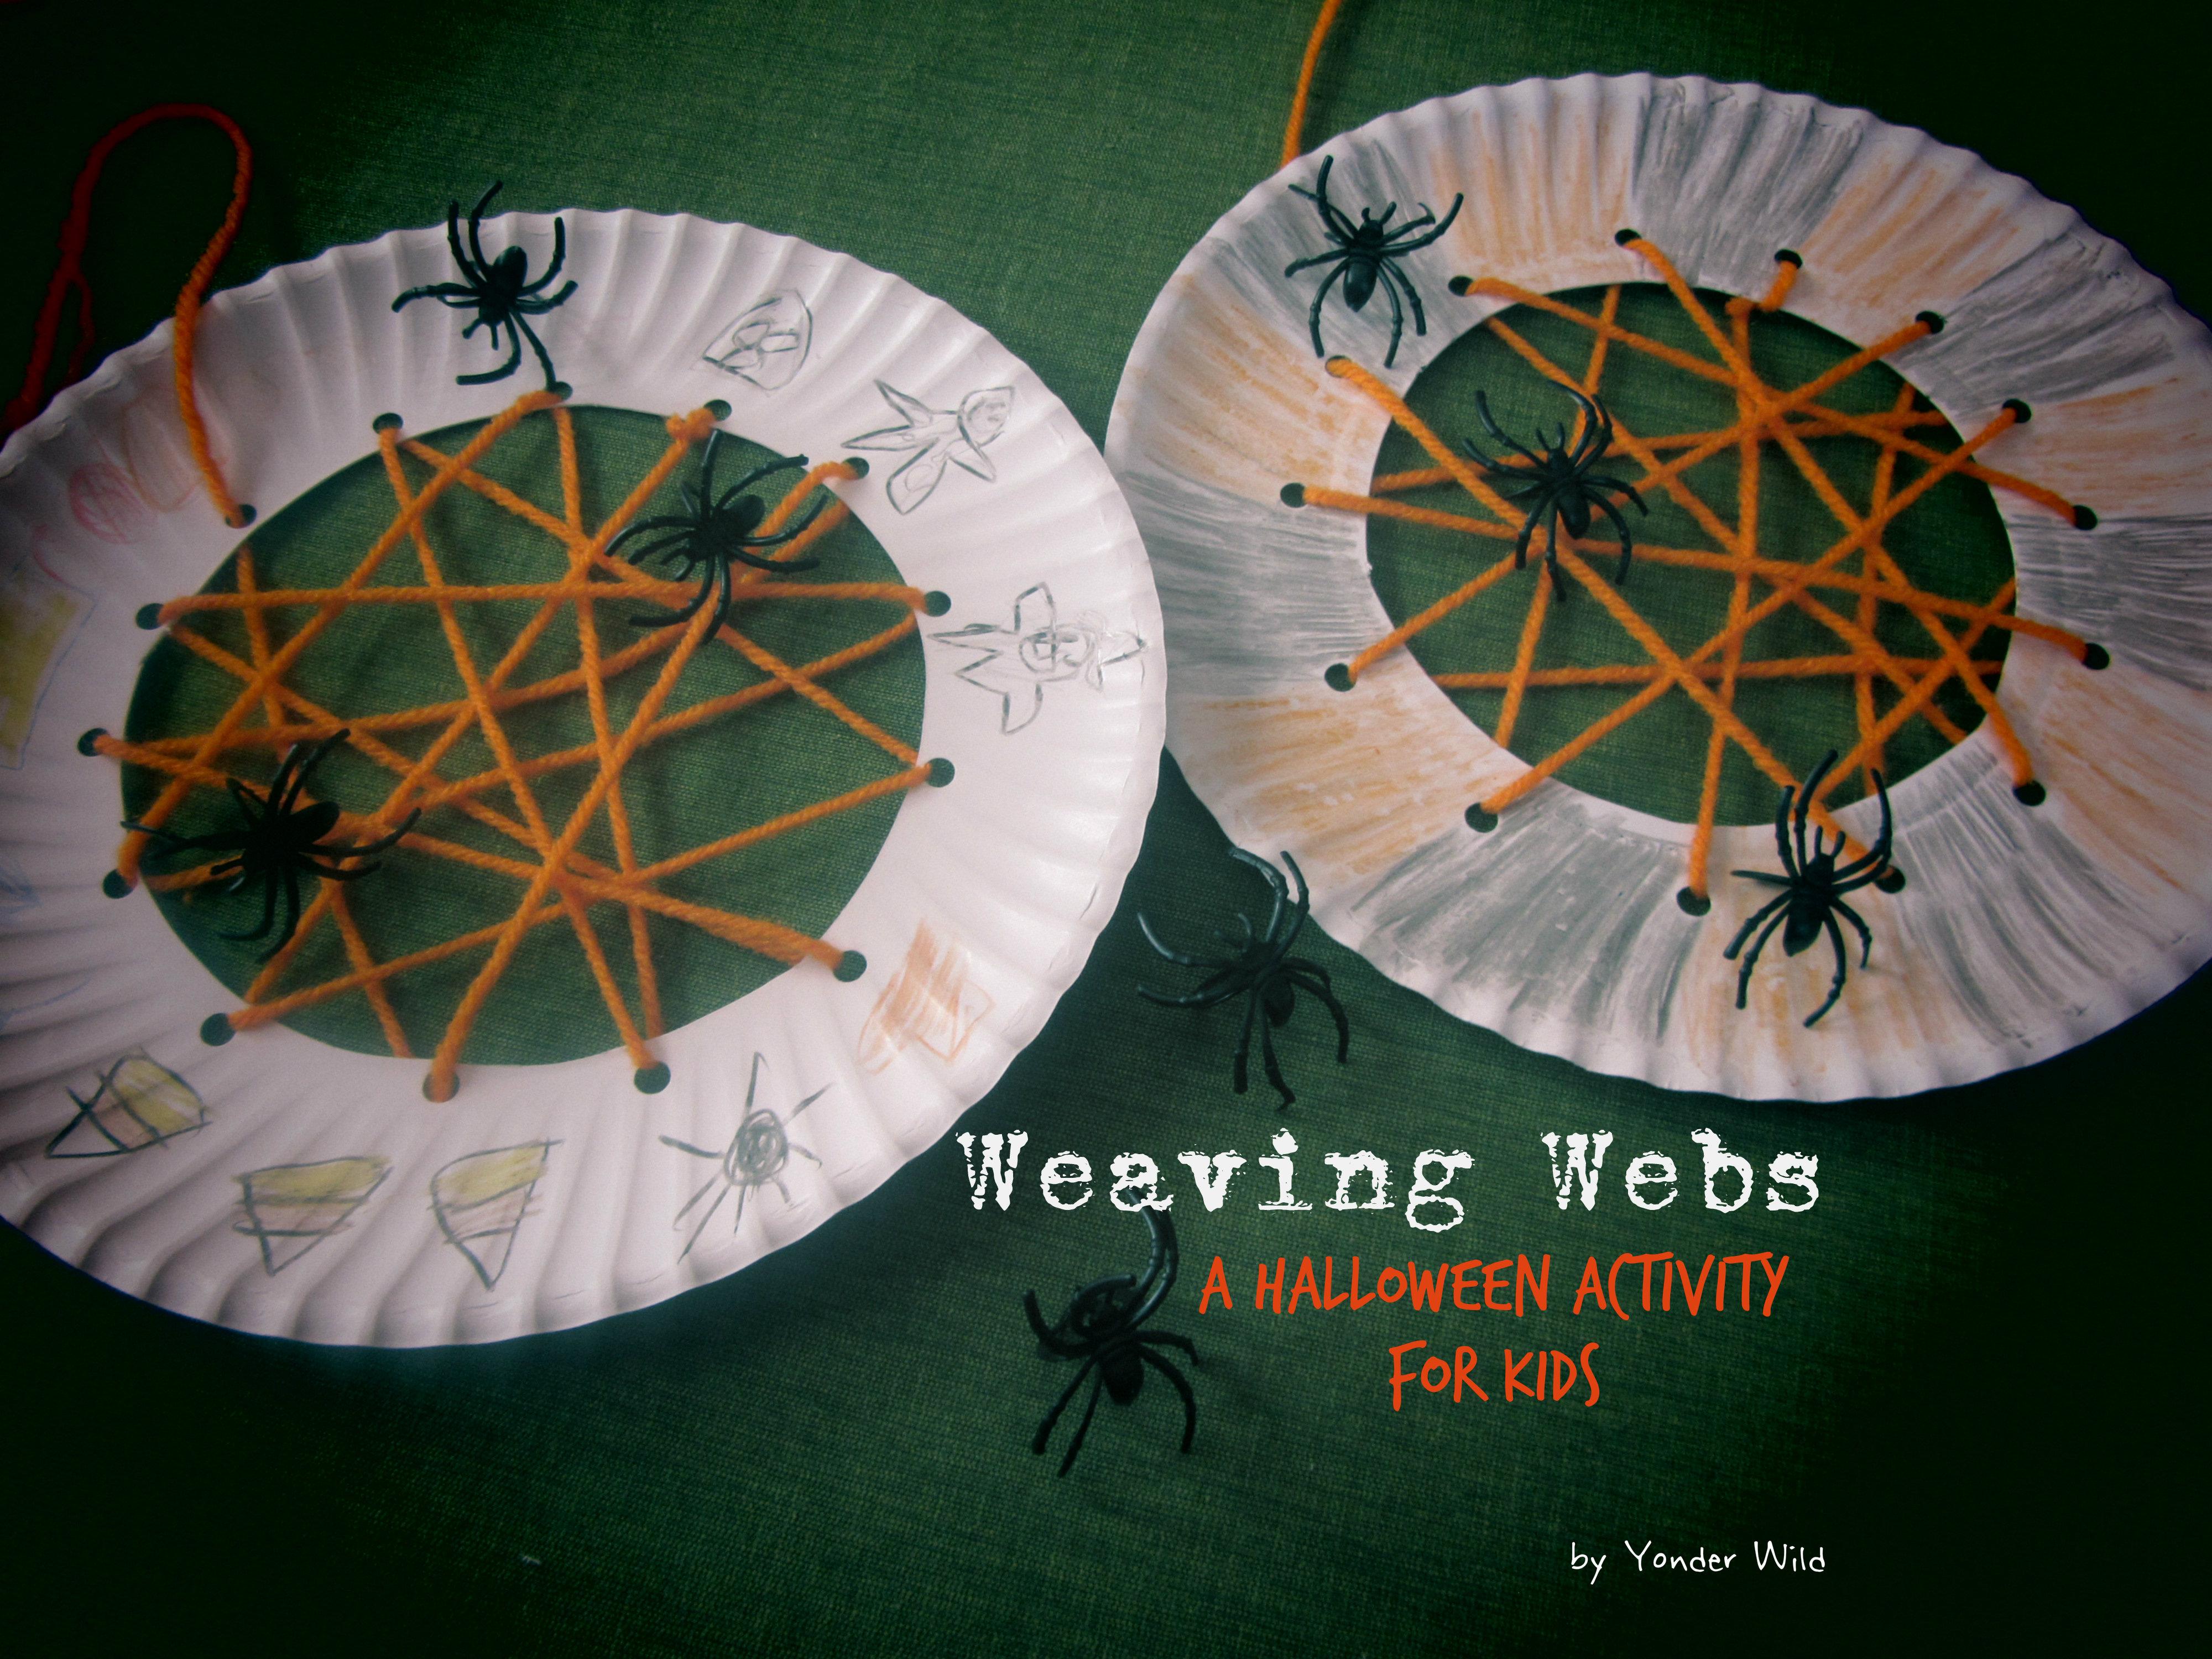 weaving webs a halloween activity for kids yonder wild